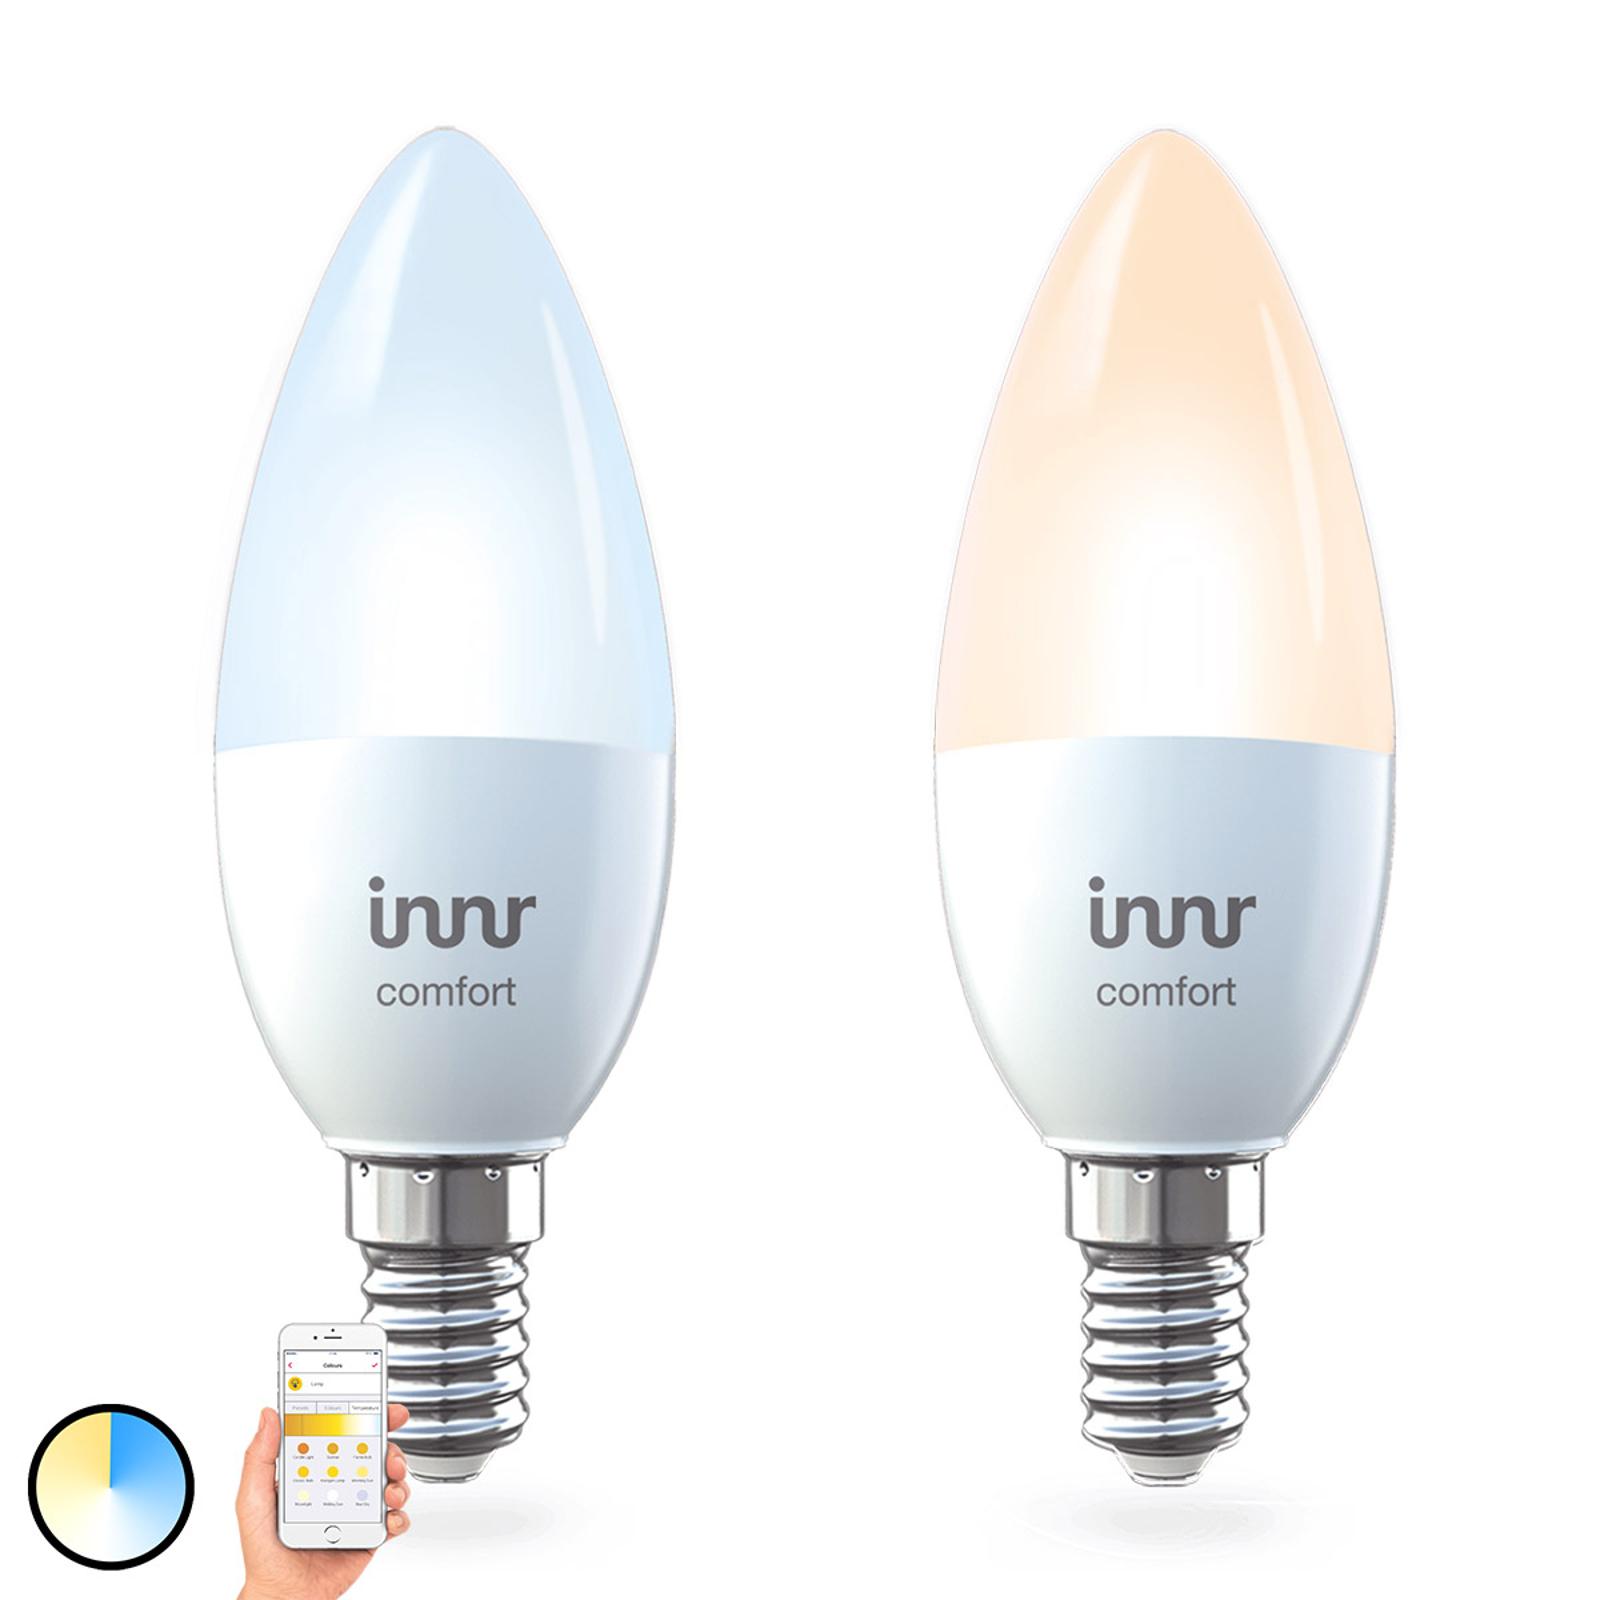 E14 5,8 W LED-Lampe Innr Smart Candle Comfort, 2er